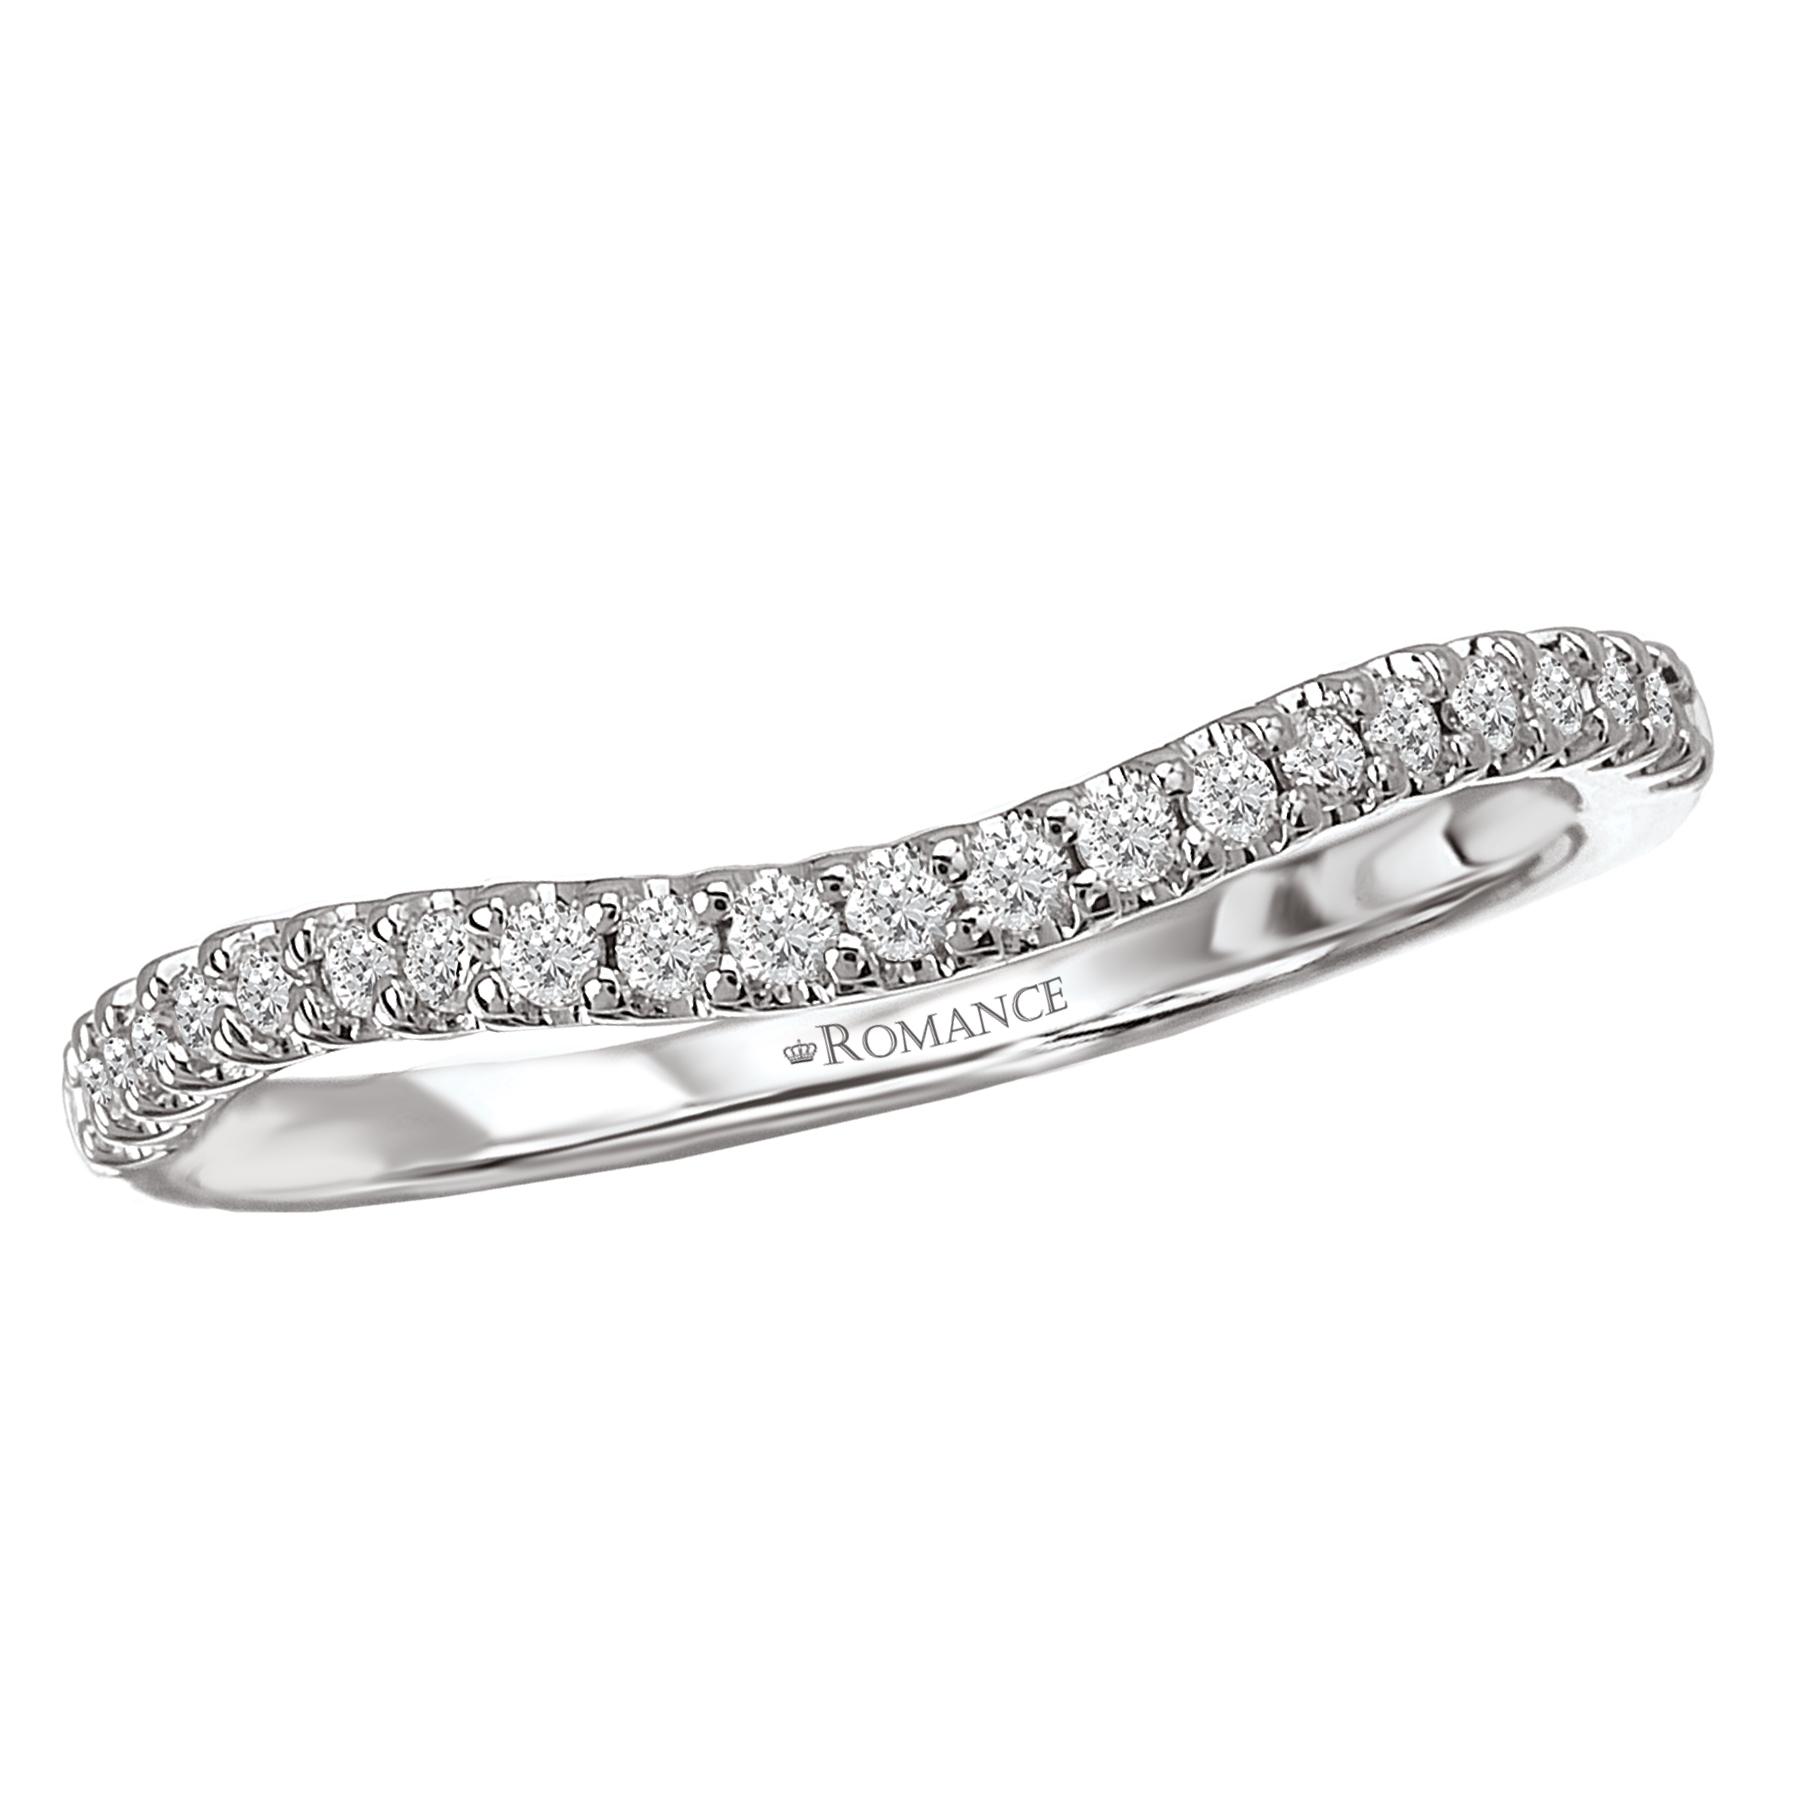 Romance Wedding Bands 117496-W product image